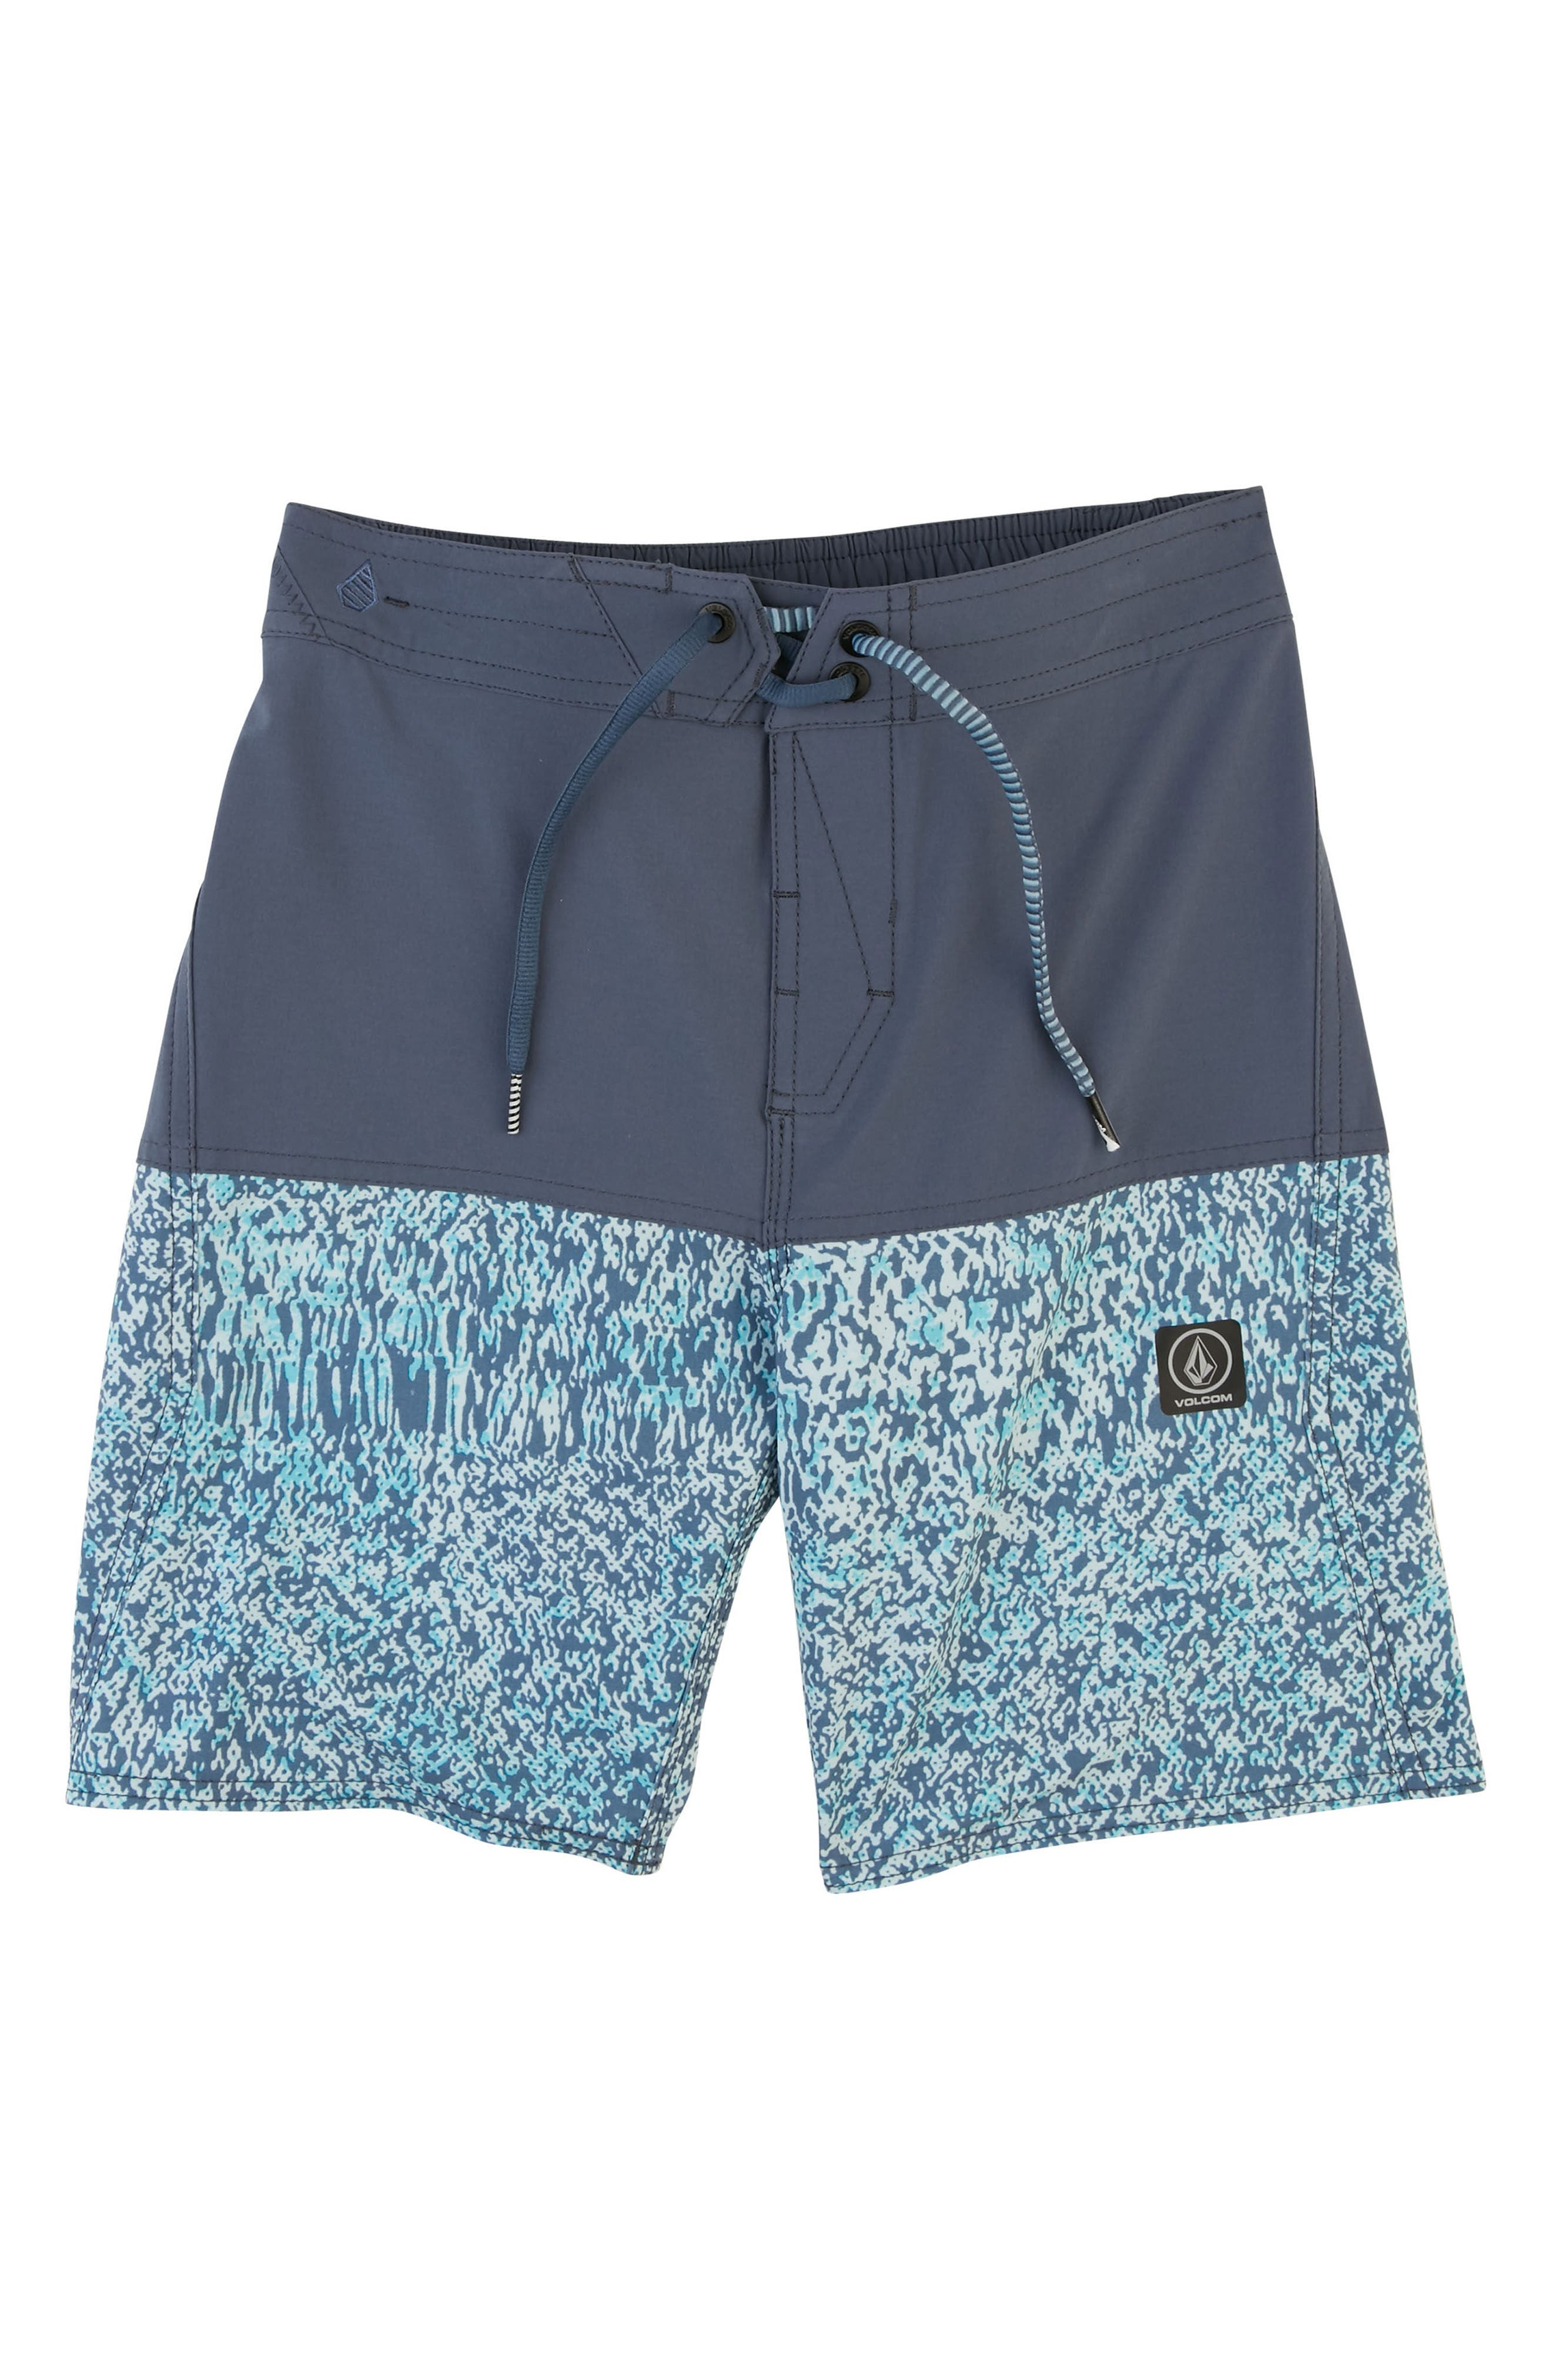 Vibes Board Shorts,                         Main,                         color, Deep Blue